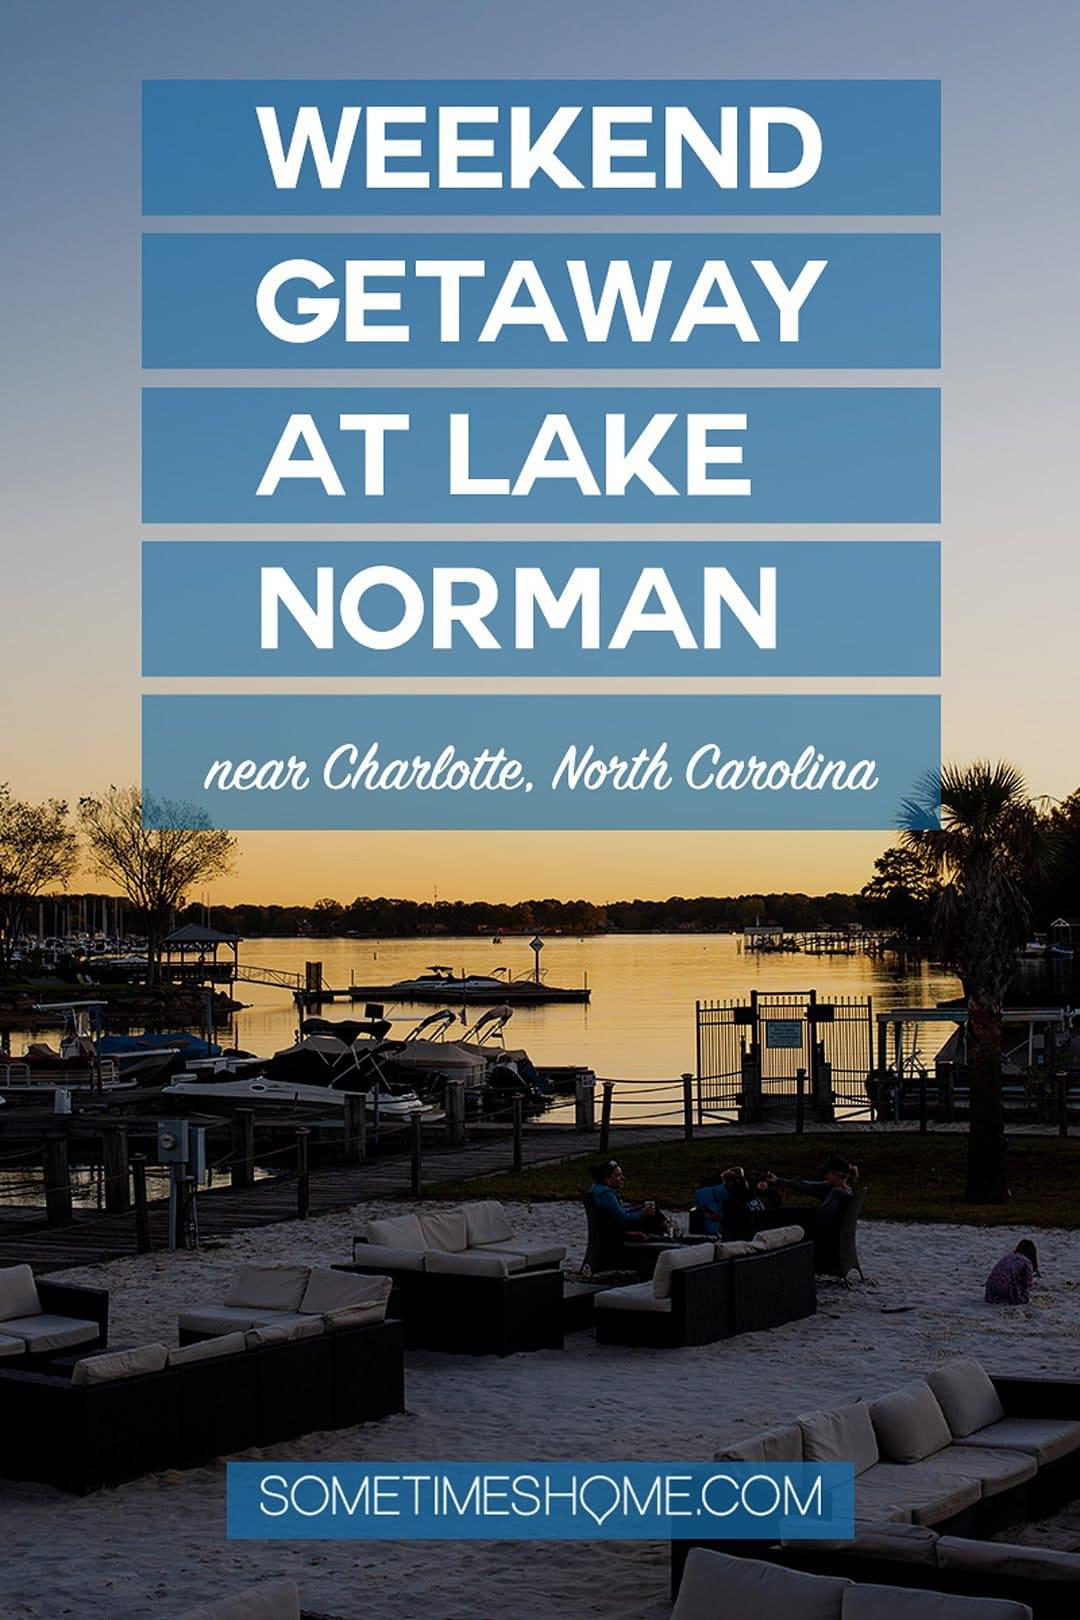 Weekend getaway near Charlotte, NC at Lake Norman | North Carolina | Piedmont Region #sometimeshome #northcarolina #visitNC